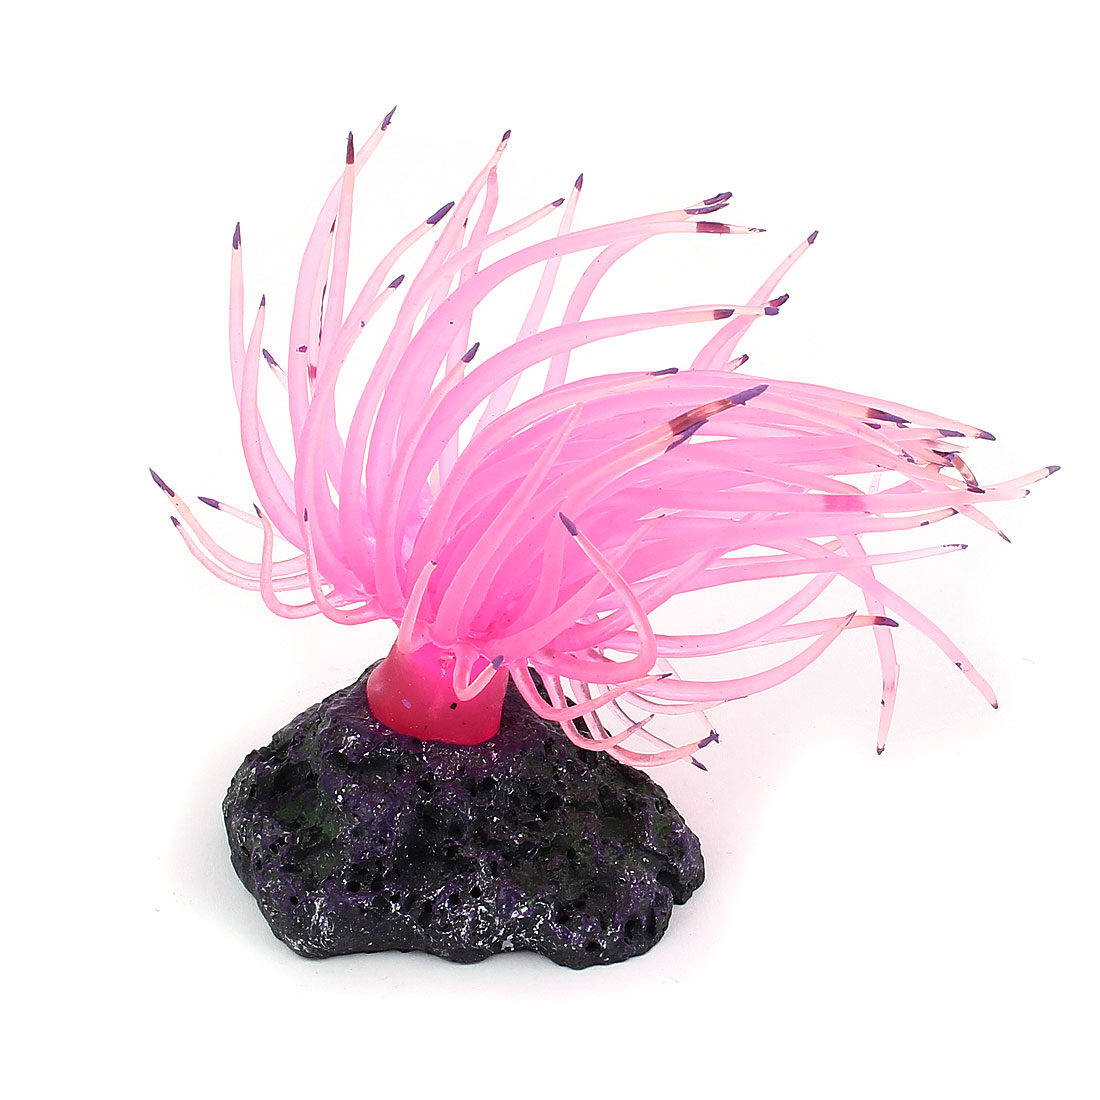 Pink Silicone Ceramic Base Aquarium Coral Ornament Underwater Plant for Fishbowl Fish Tank